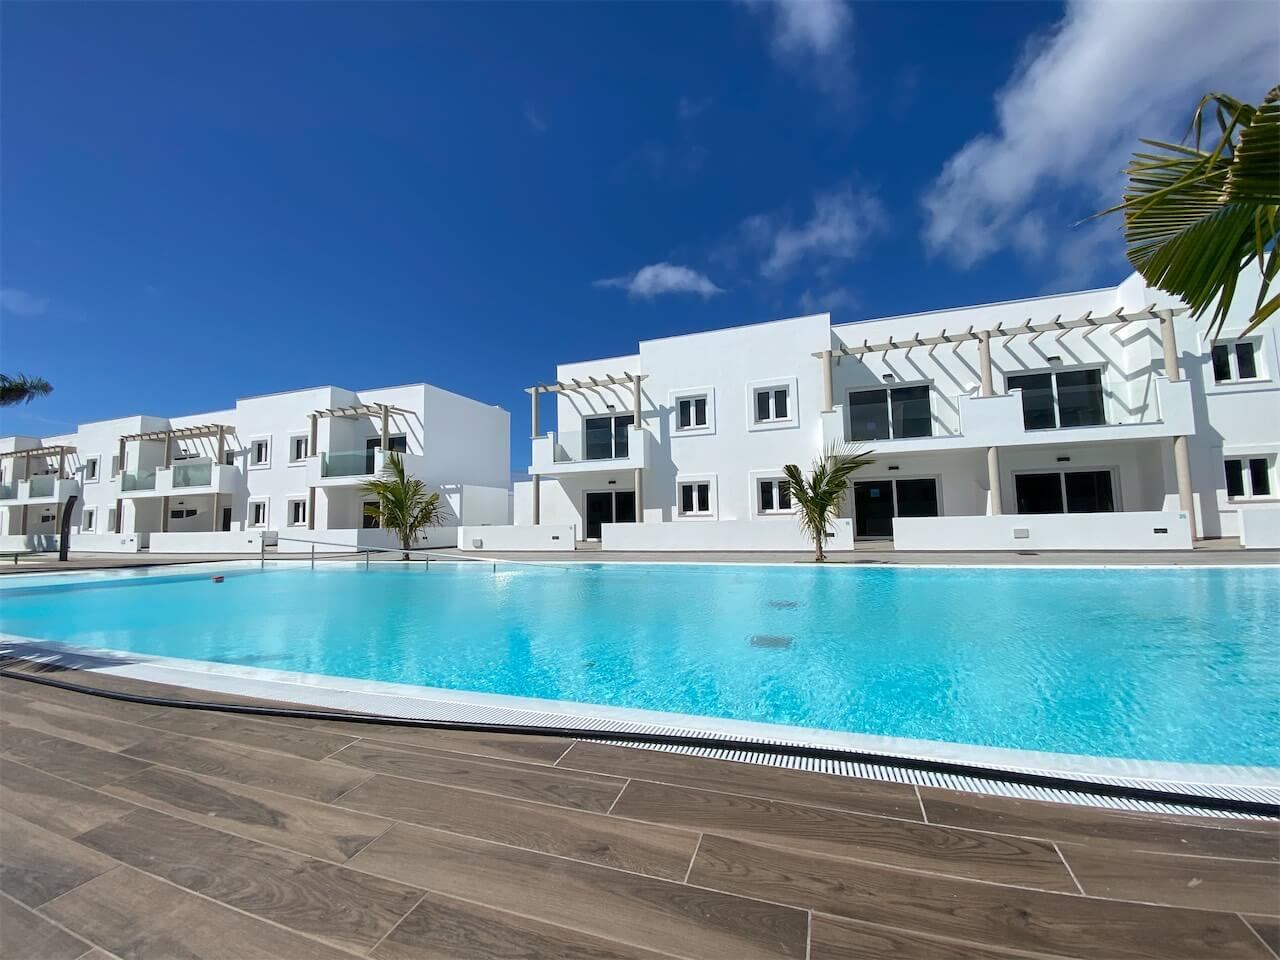 New development Island Home Corralejo